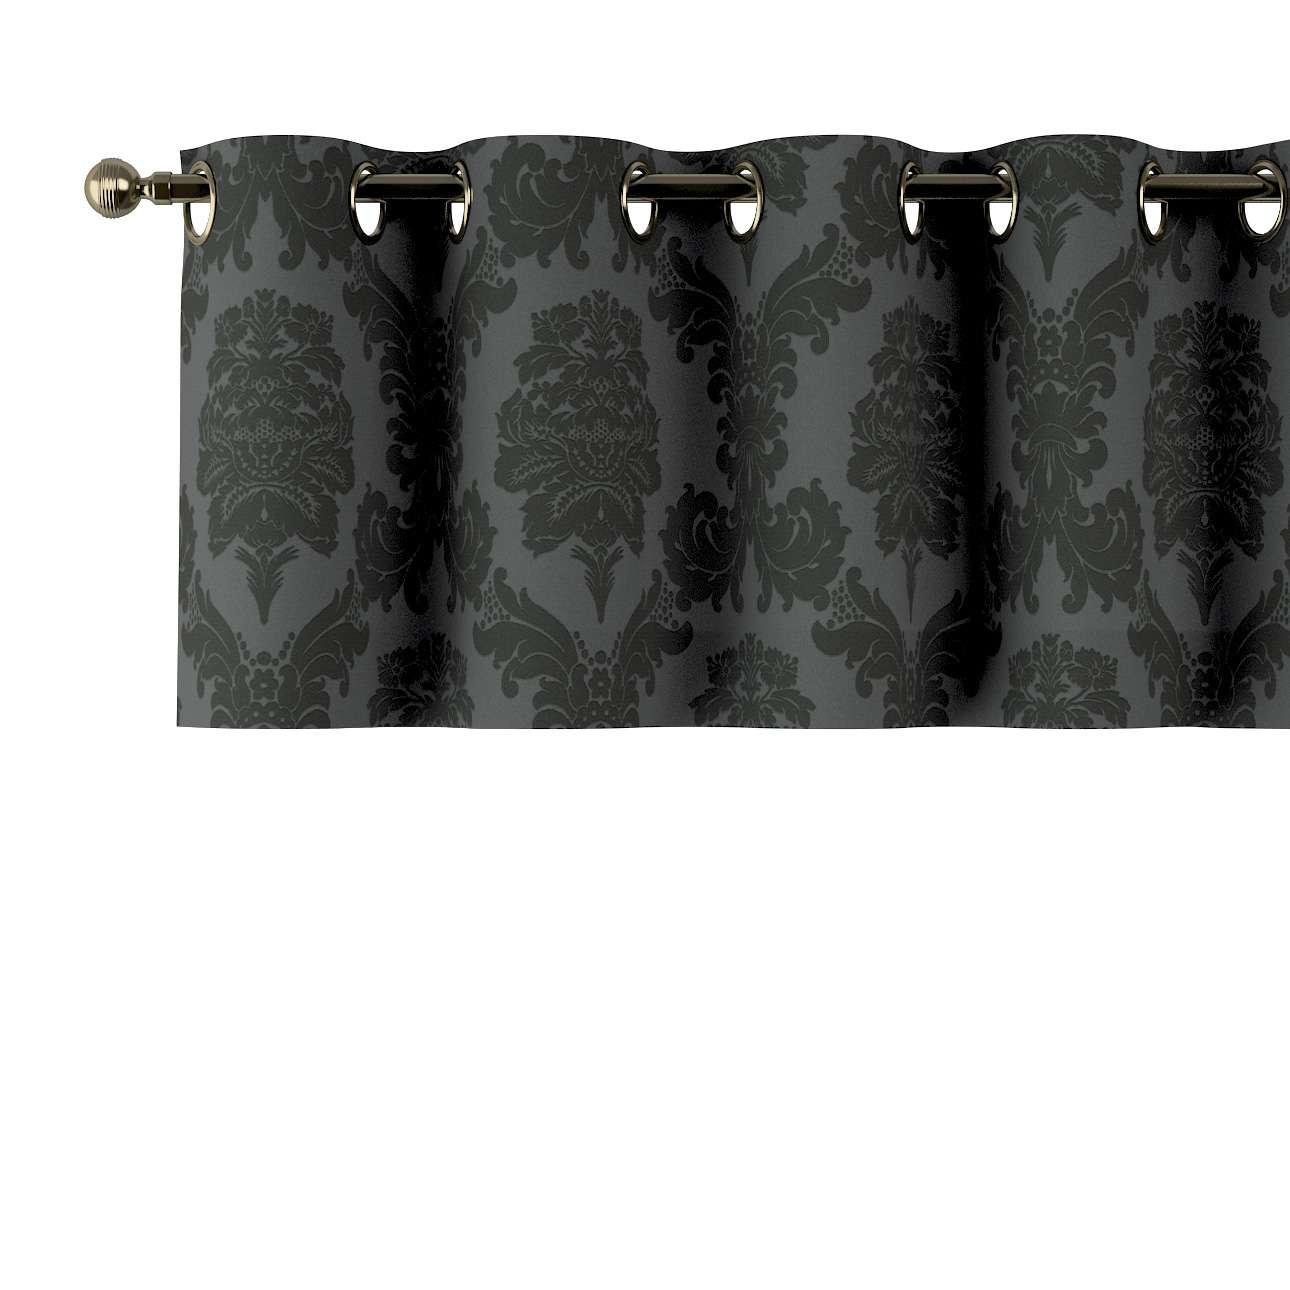 Gardinkappa med öljetter 130x40cm i kollektionen Damasco, Tyg: 613-32